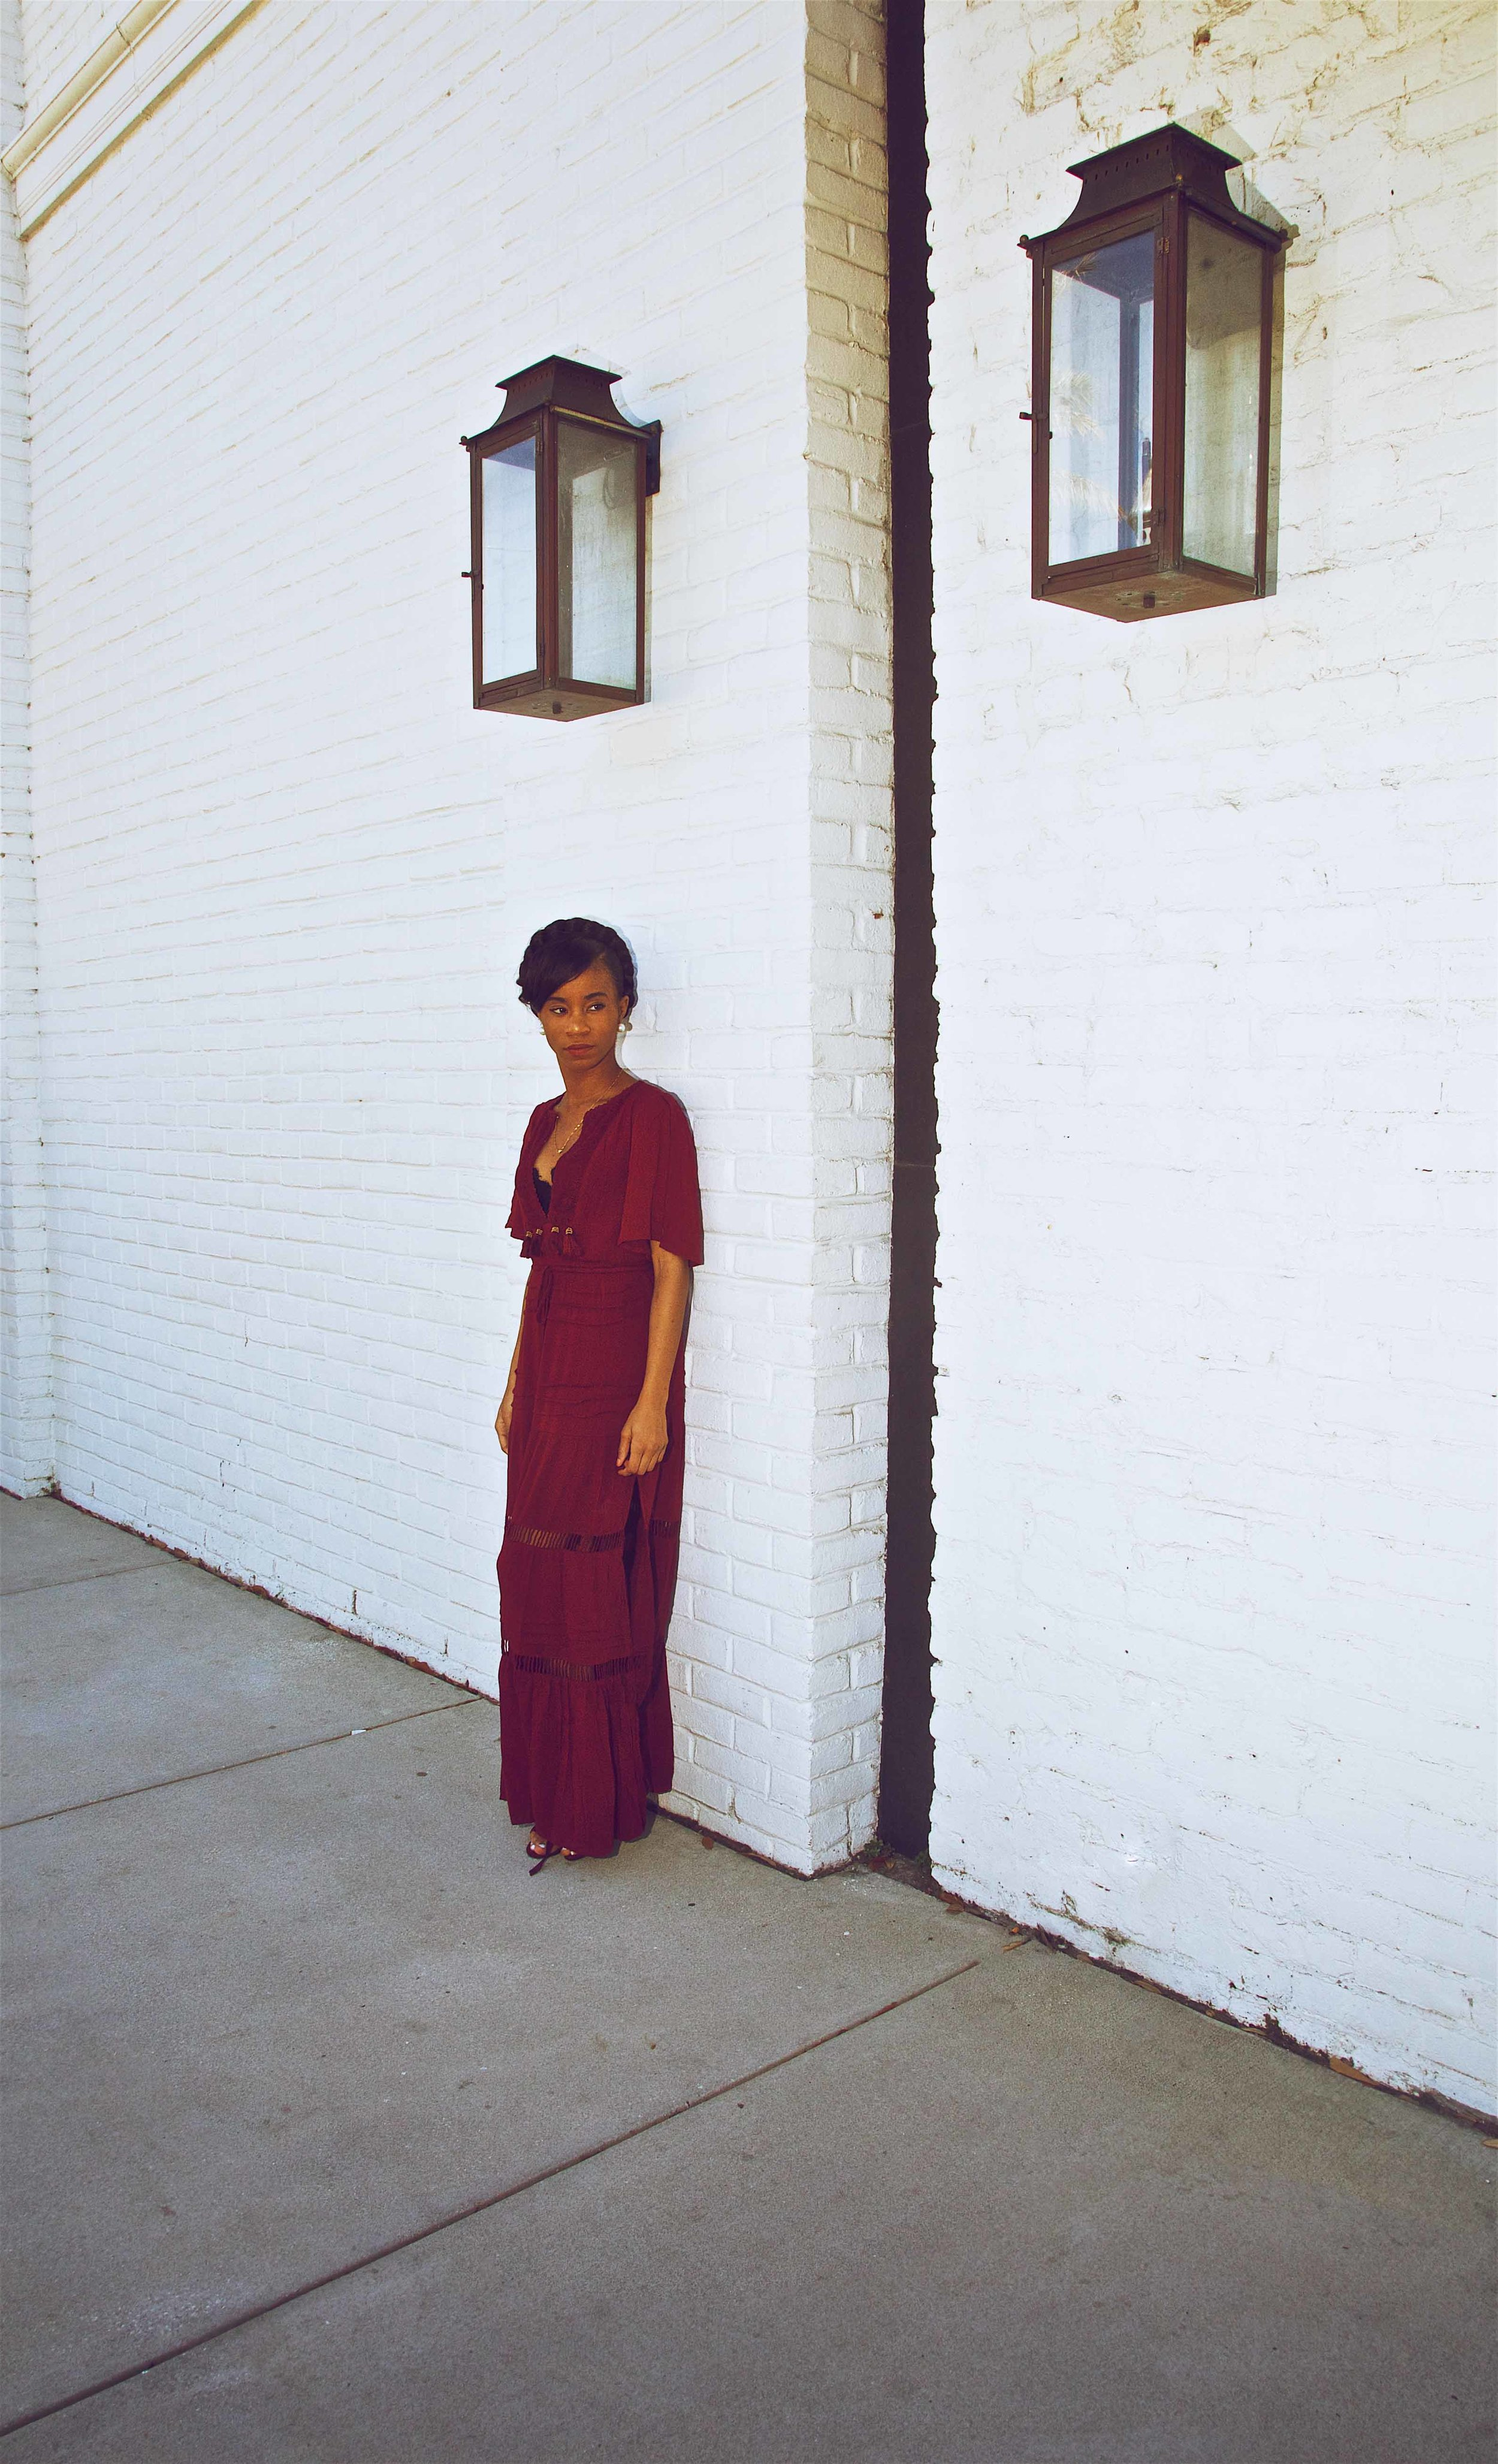 2018.3.3 Kayla Boronell by StanChambersJr Photography 3 small.jpg